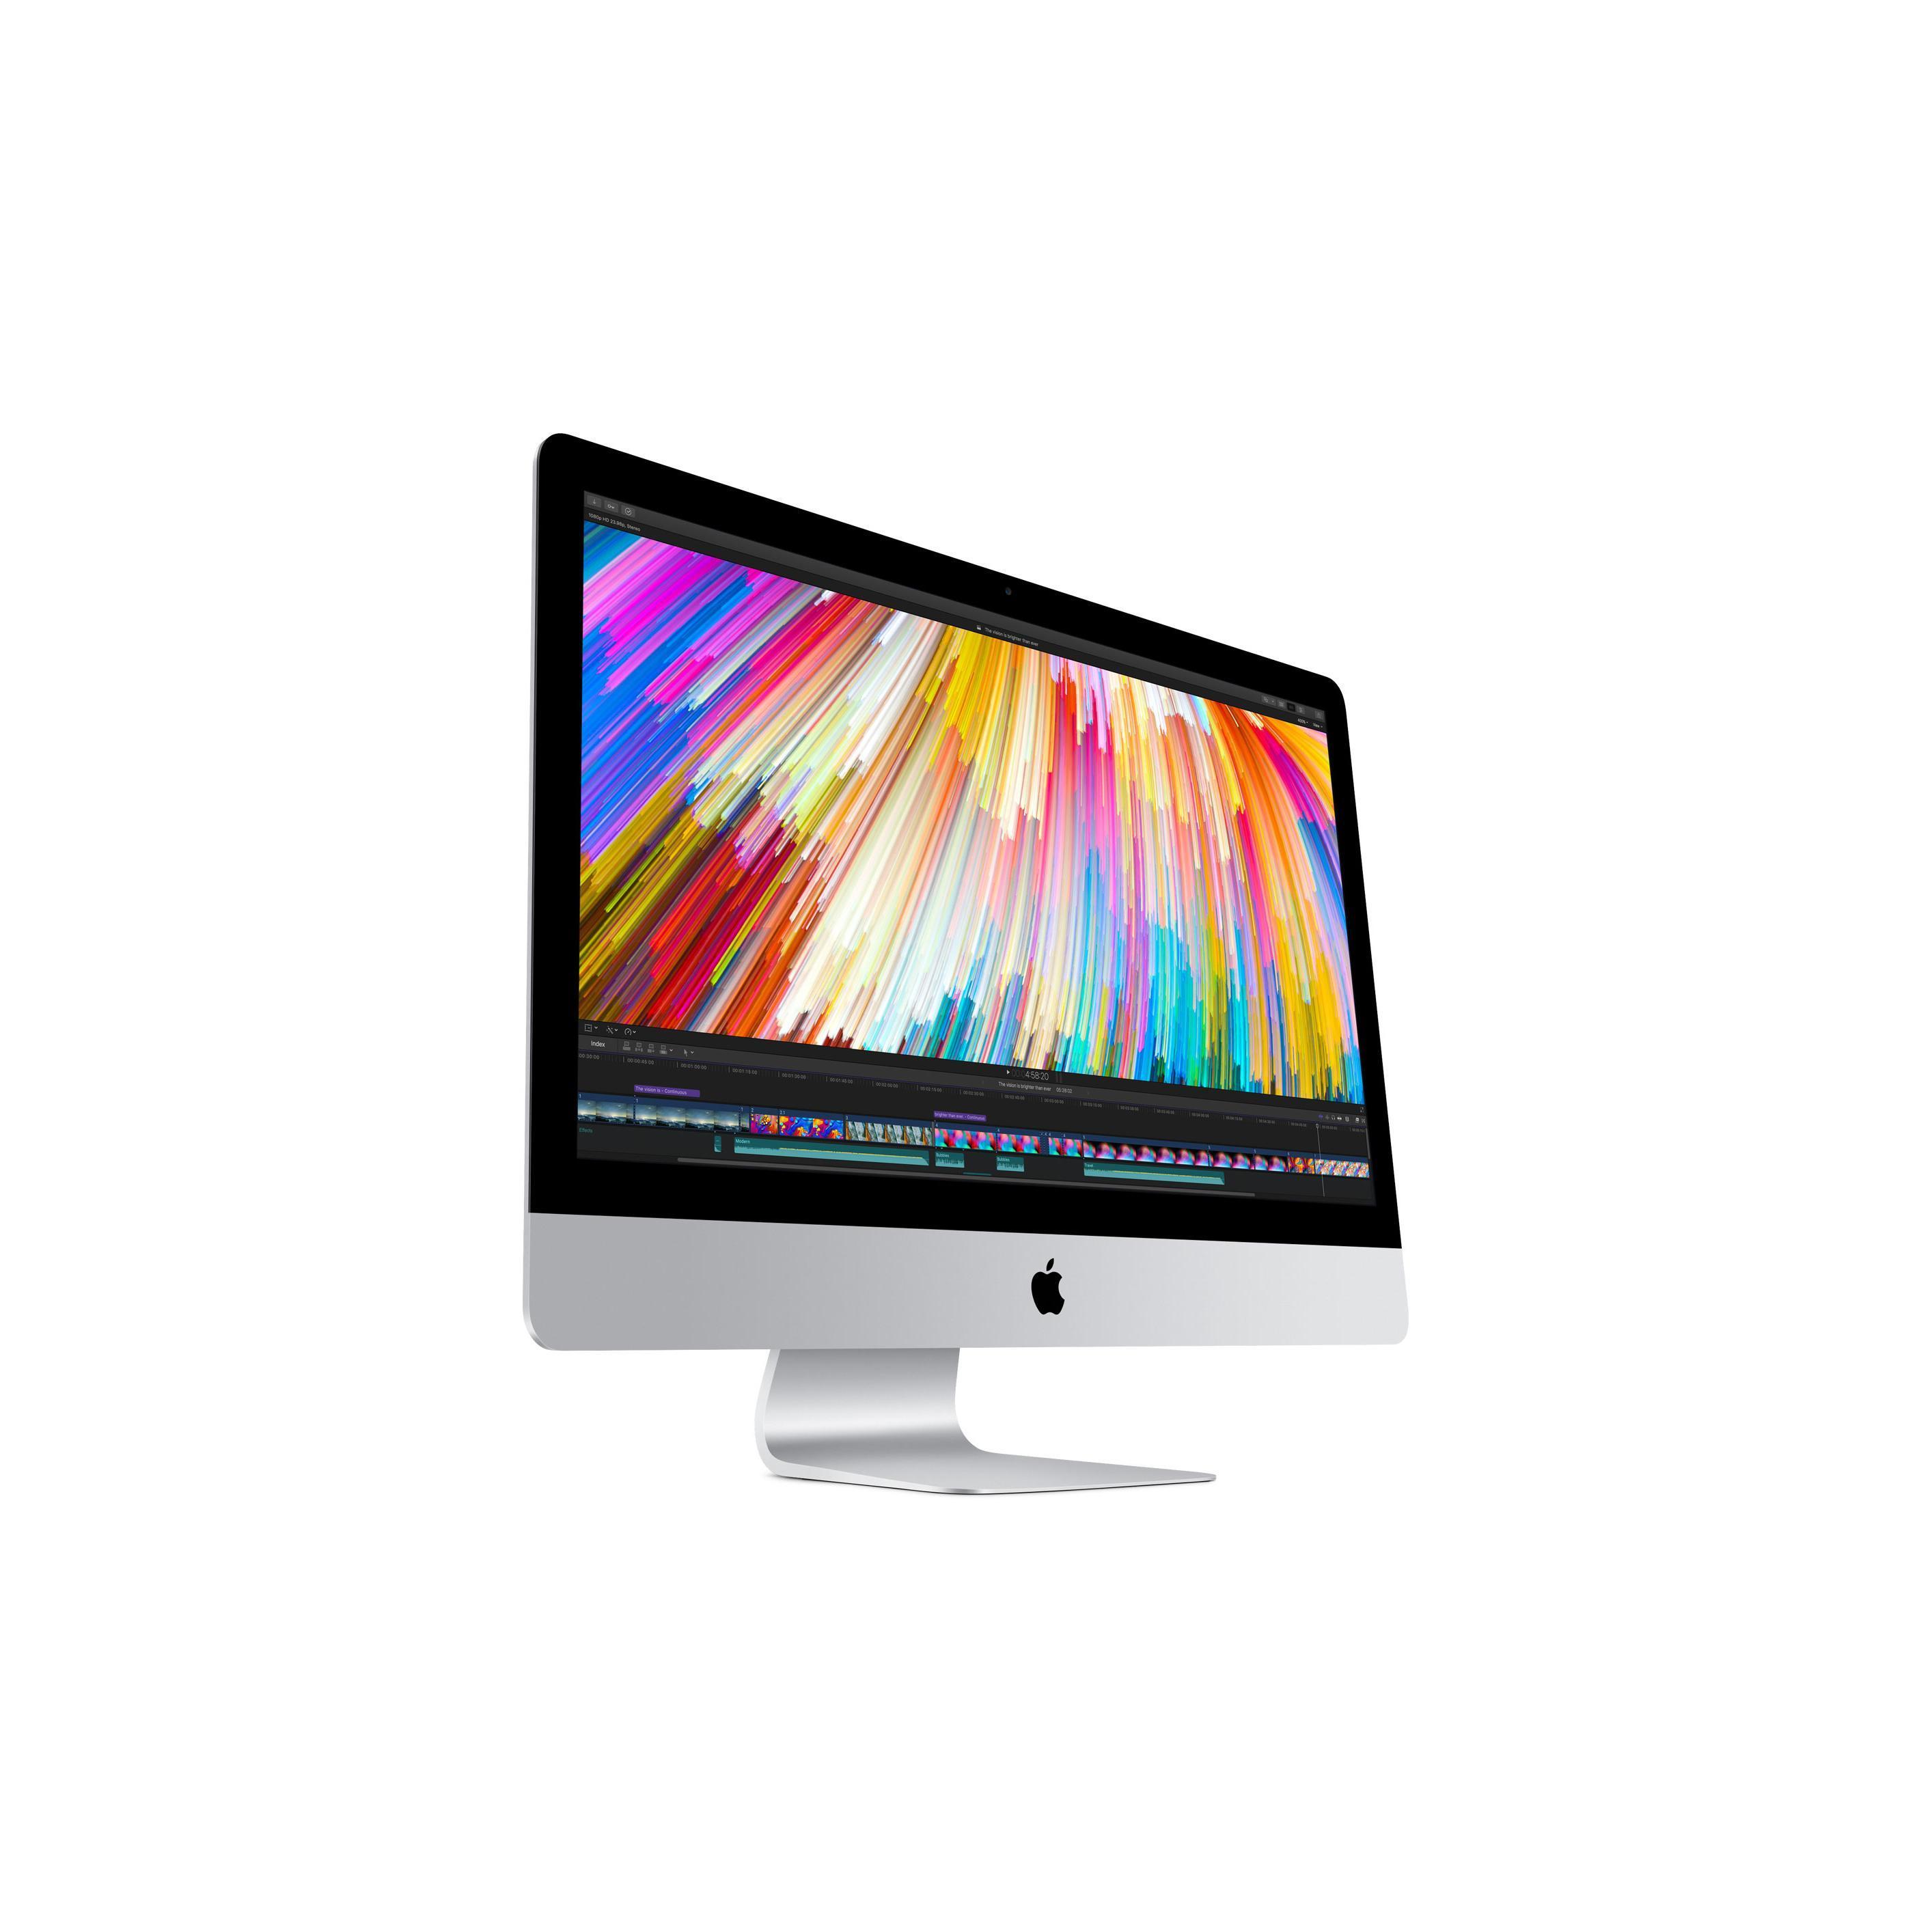 "iMac Retina 27"" (2015) - Core i5 - 16GB - HDD 1 tb QWERTY - Ισπανικό"